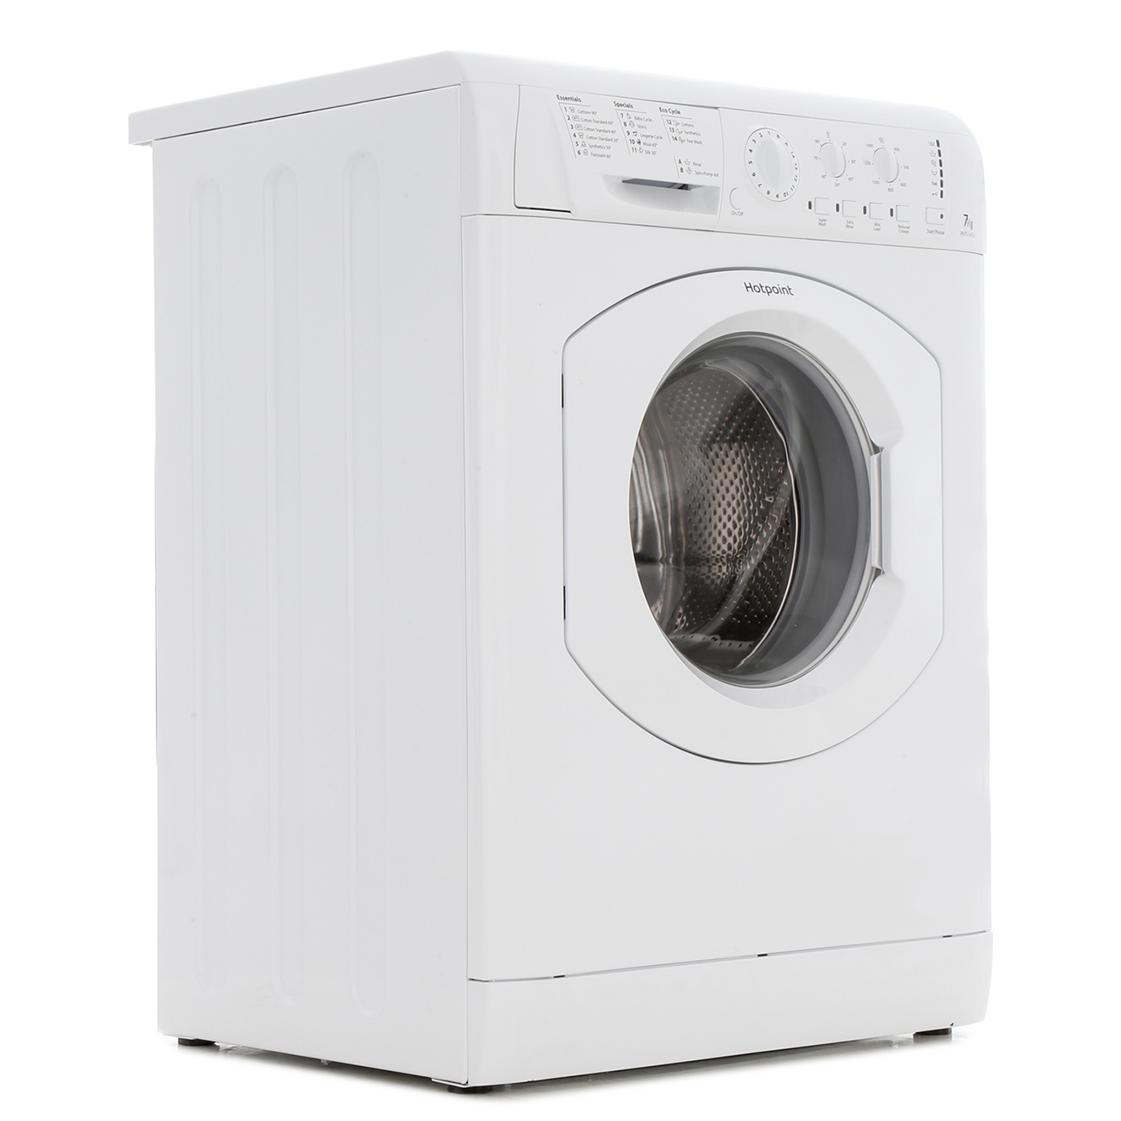 Hotpoint HV7L1451P Washing Machine